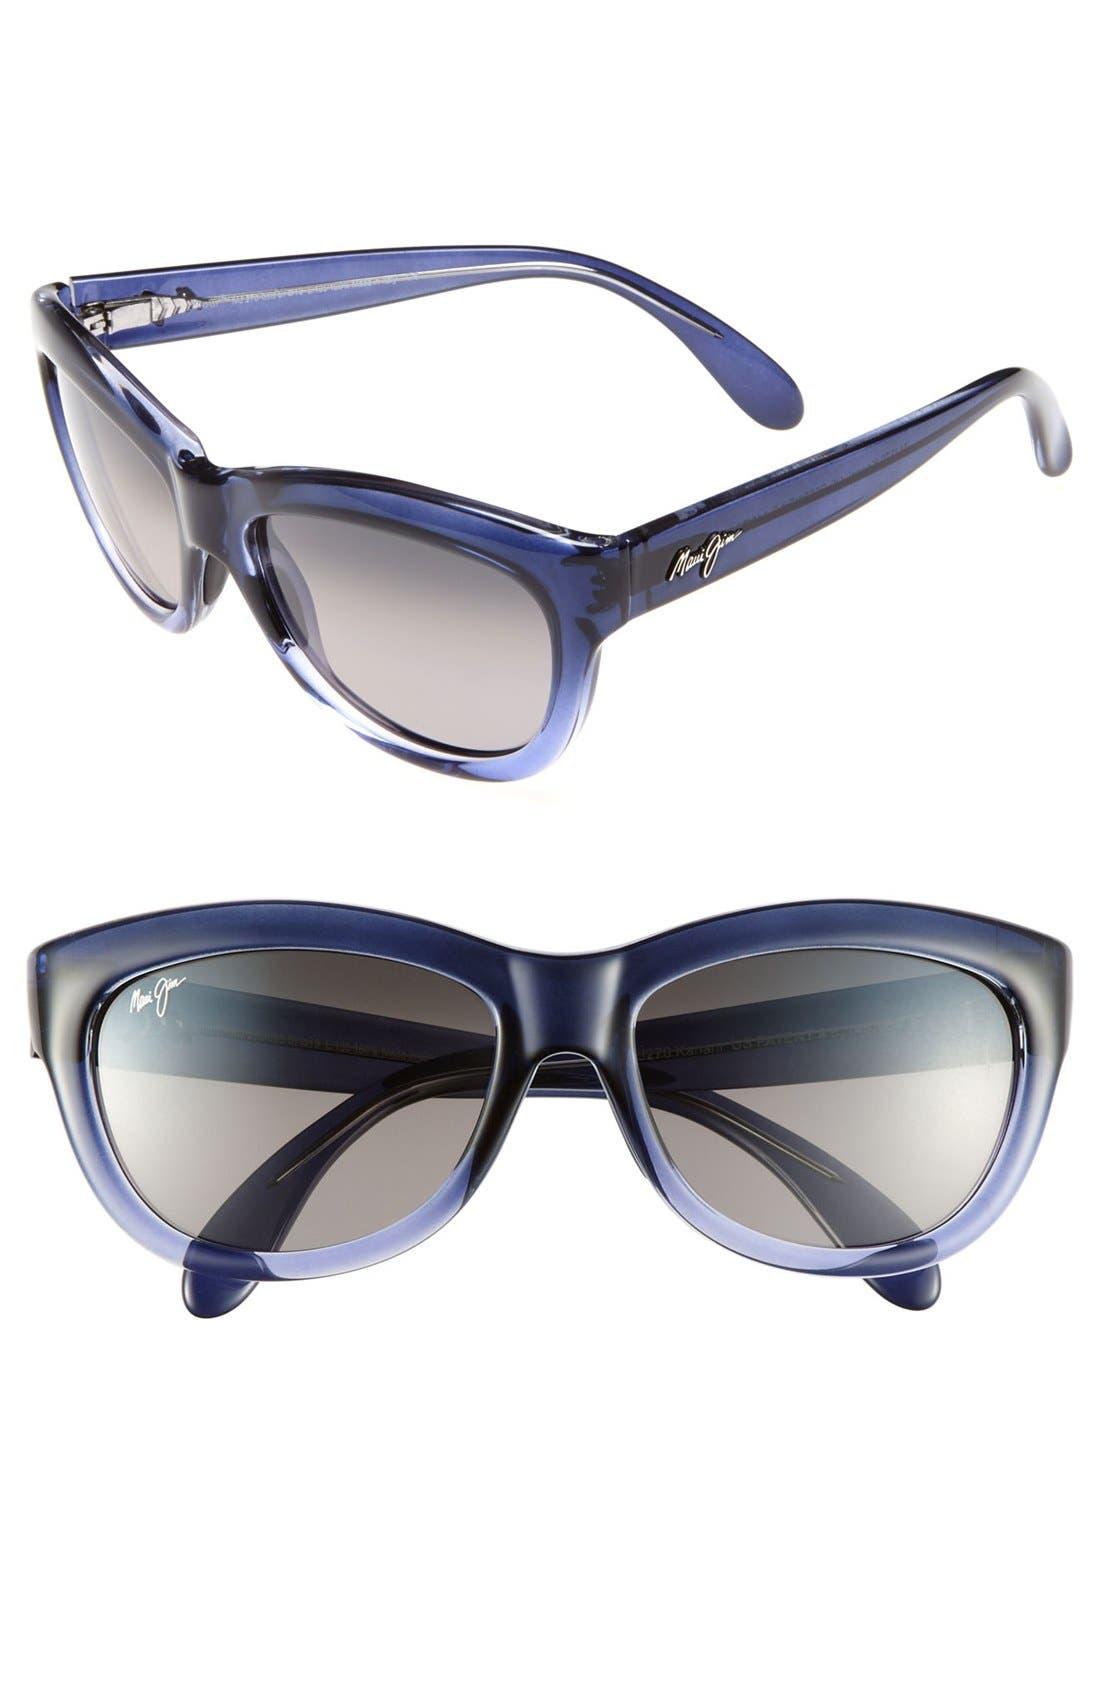 Main Image - Maui Jim 'Kanani' 57mm Sunglasses